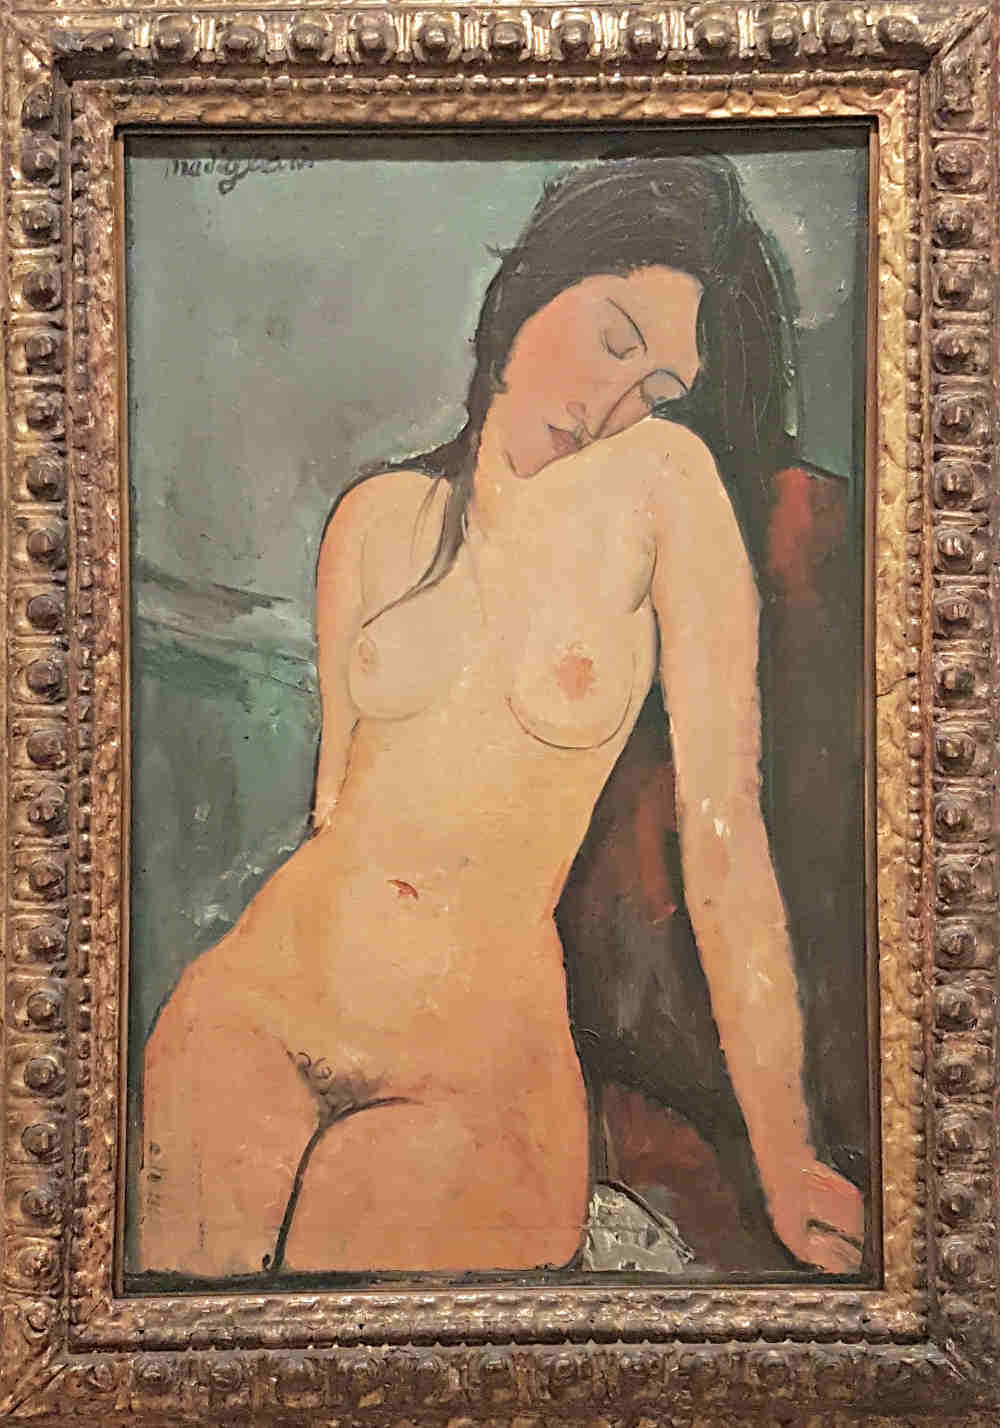 Erotic London, Erotic Art London, Erotic Art in London, Modigliani, Courtauld Gallery